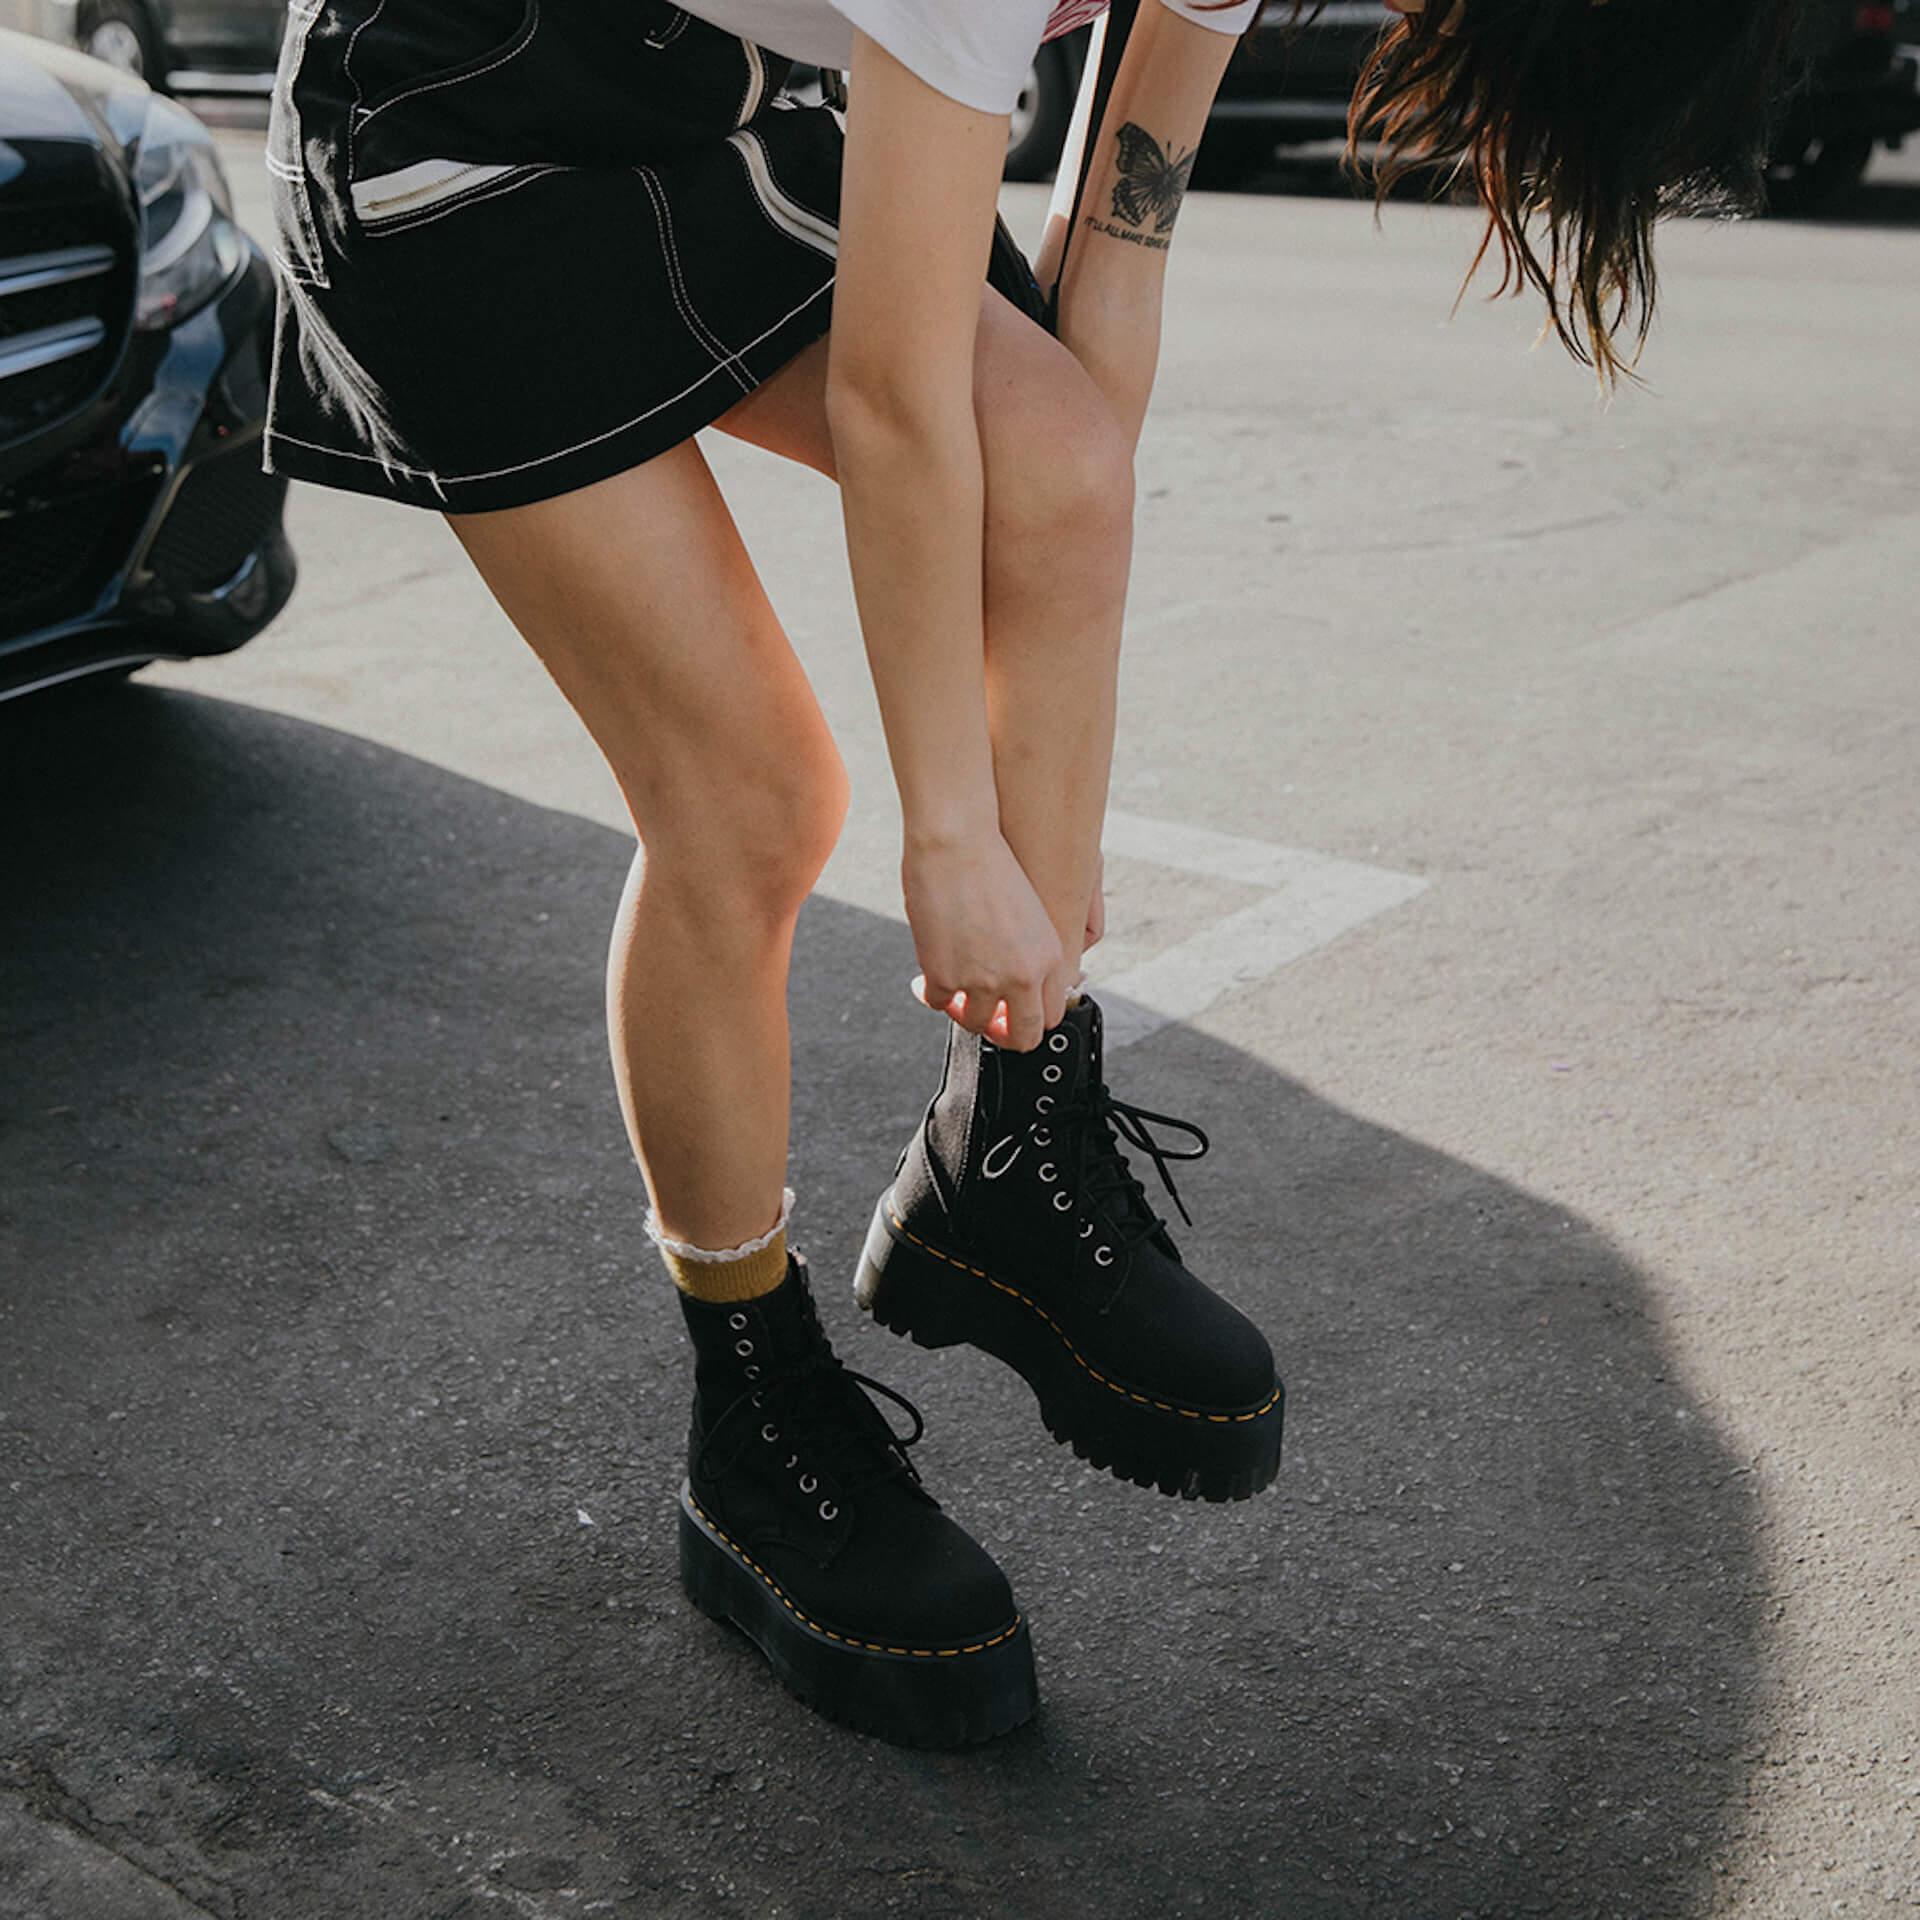 Dr.MartensとX-girlが2度目のコラボコレクションを発表!定番厚底ブーツ&厚底サンダルをベースにした2モデル fation210607_DR.MARTENS-x-X-GIRL-5